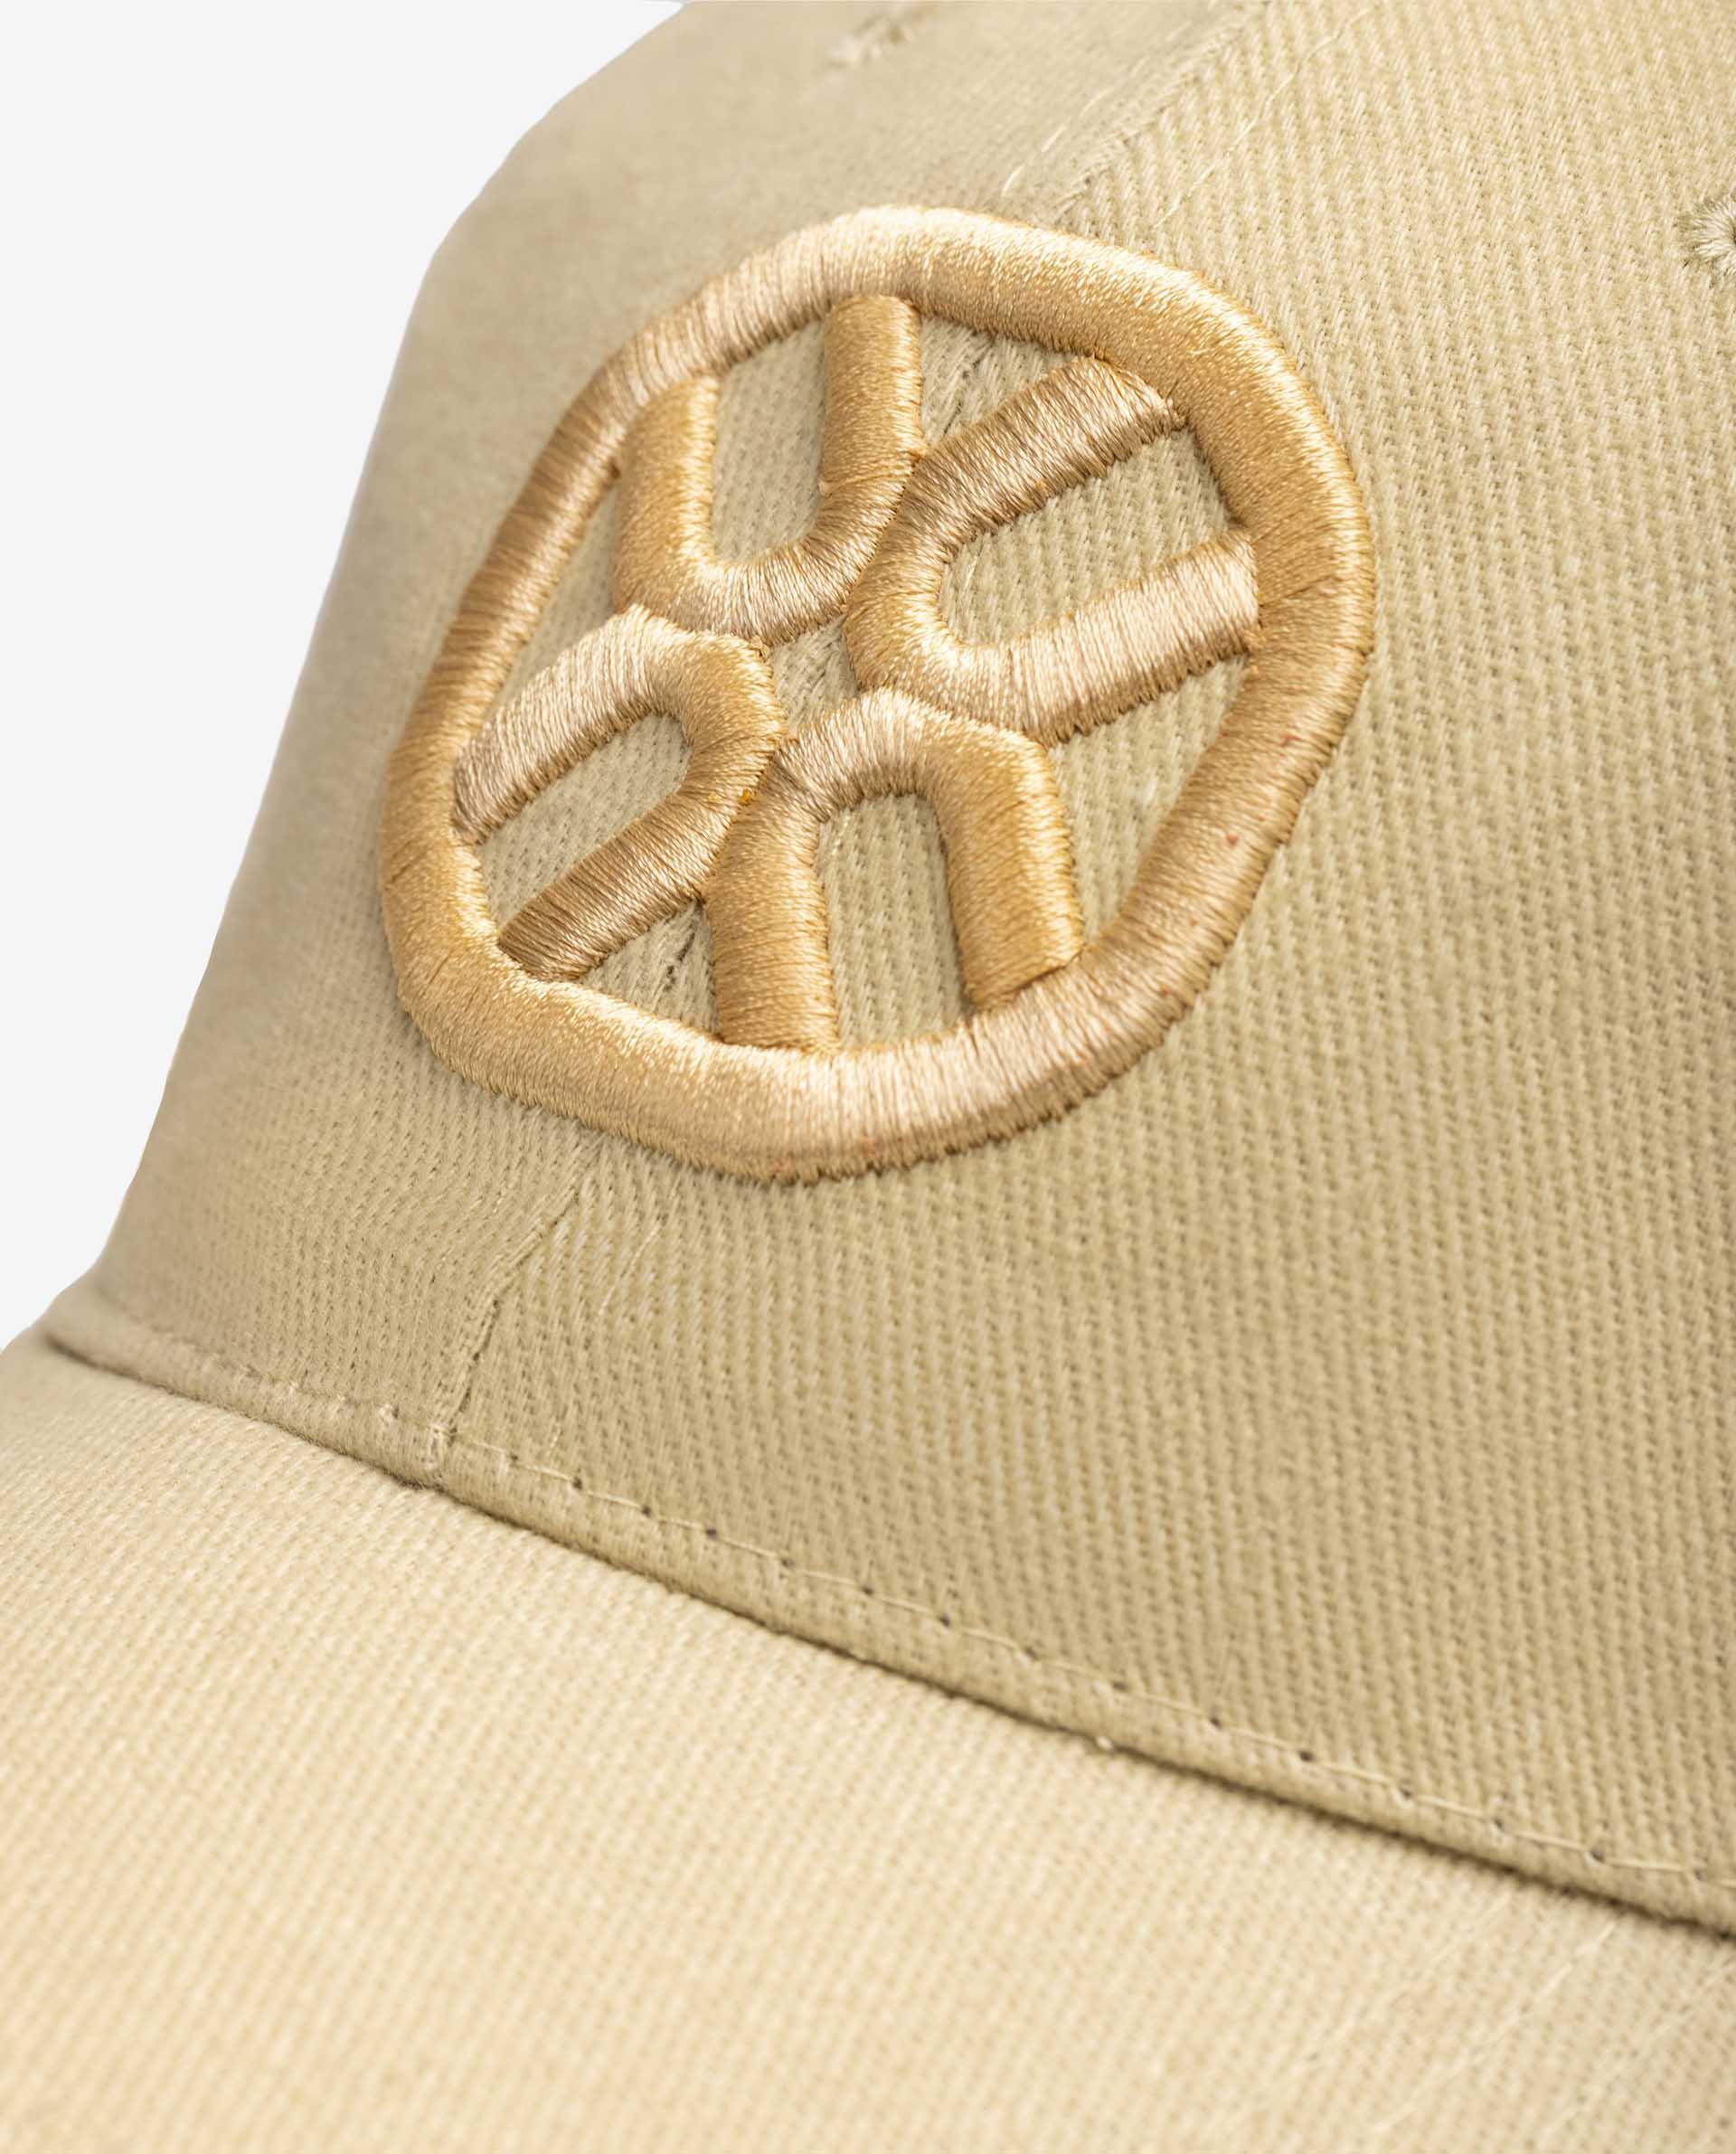 Unisa Gorras y sombreros GORRA_UNI beige 4